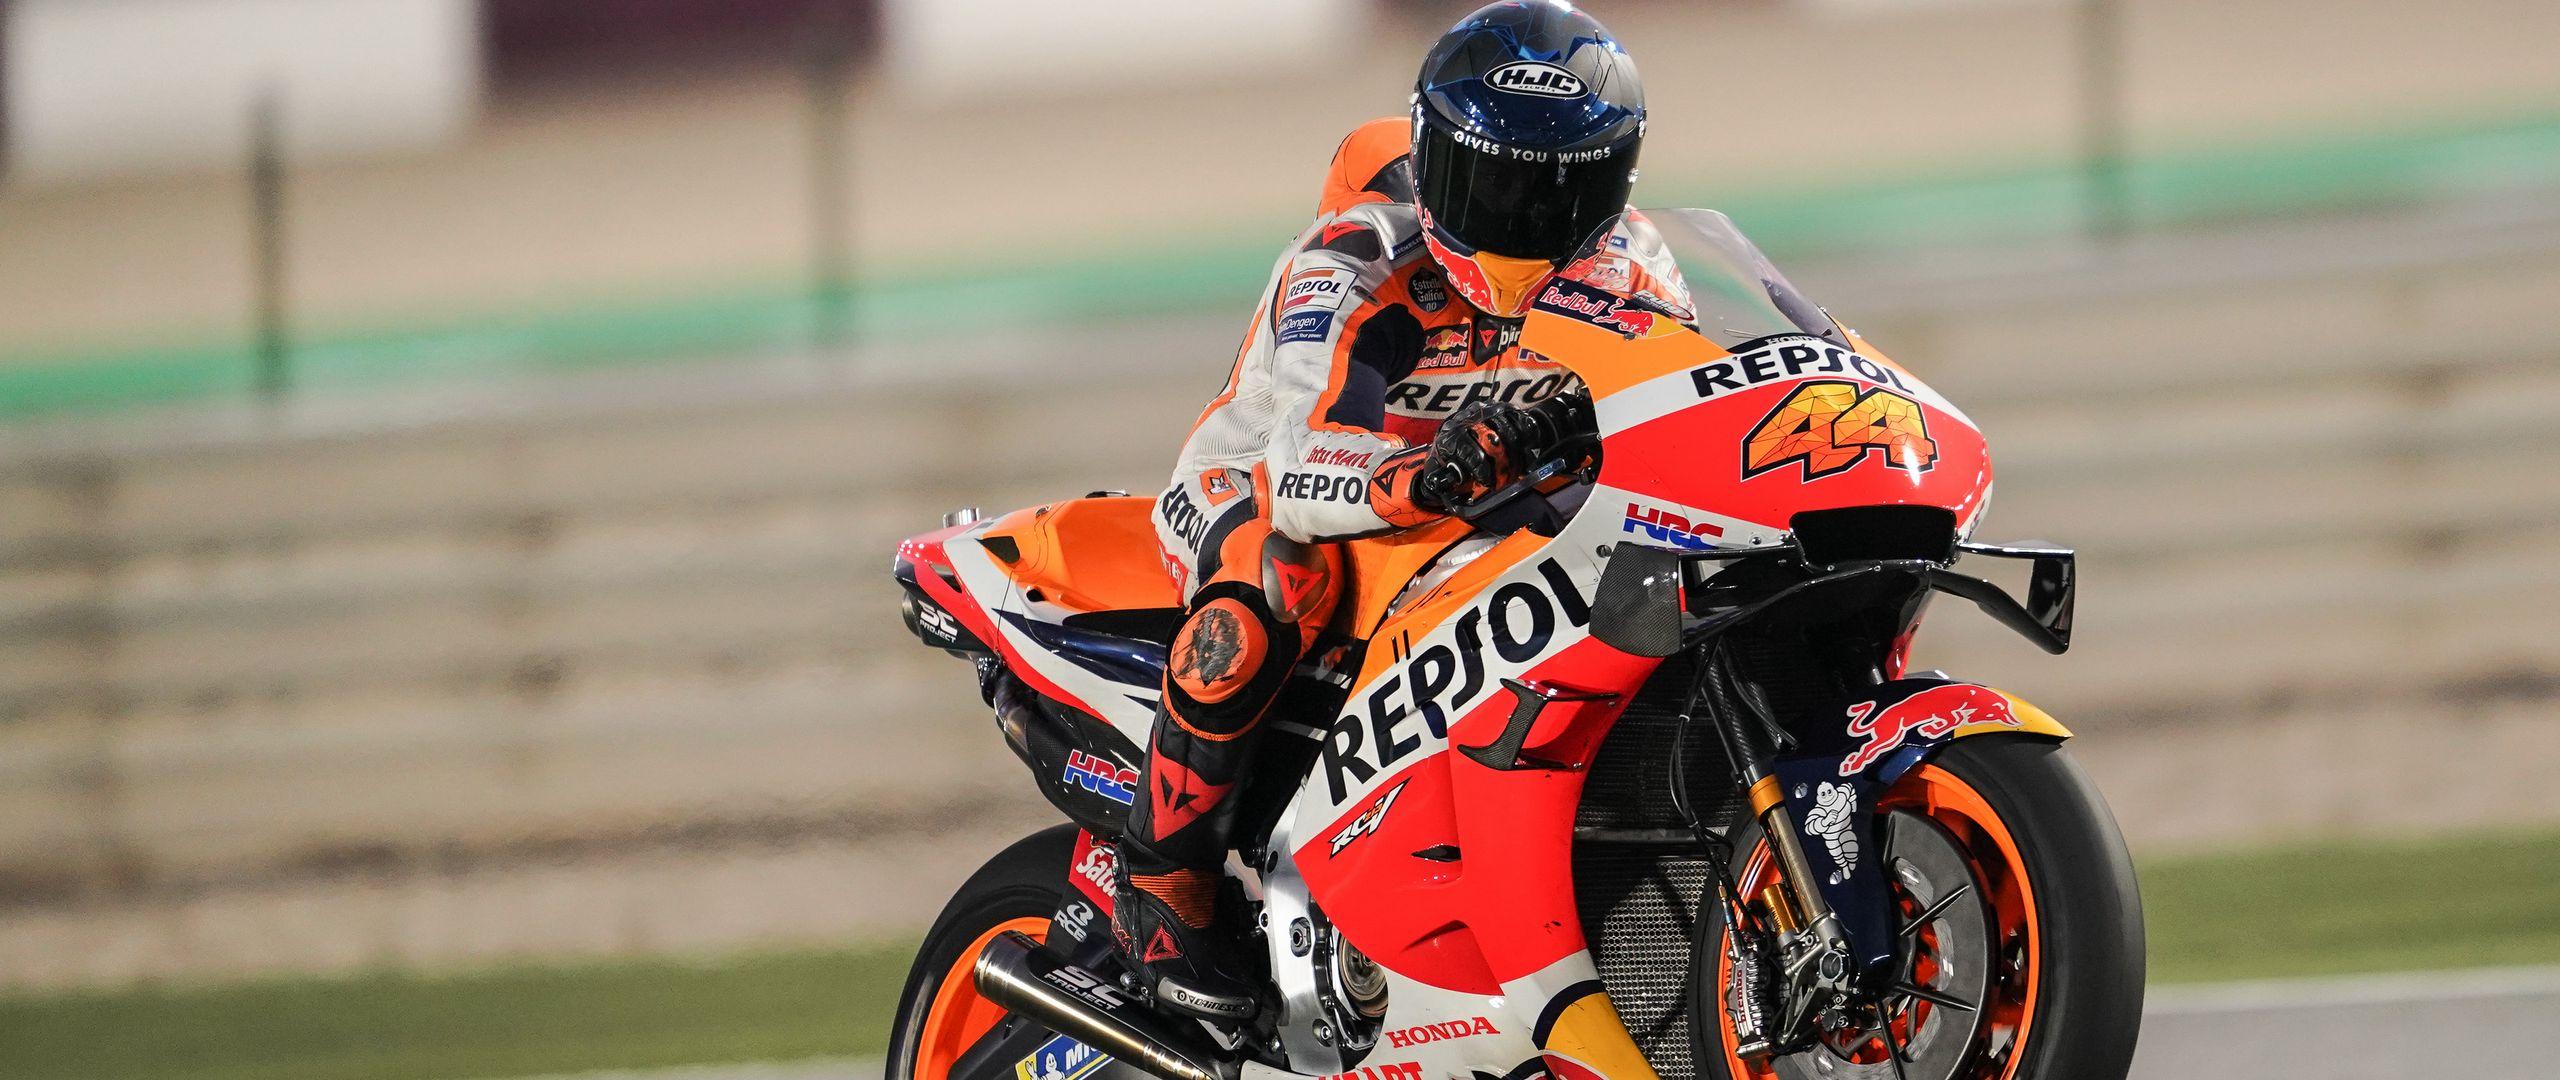 2560x1080 Wallpaper honda, motorcycle, motorcyclist, helmet, speed, track, orange